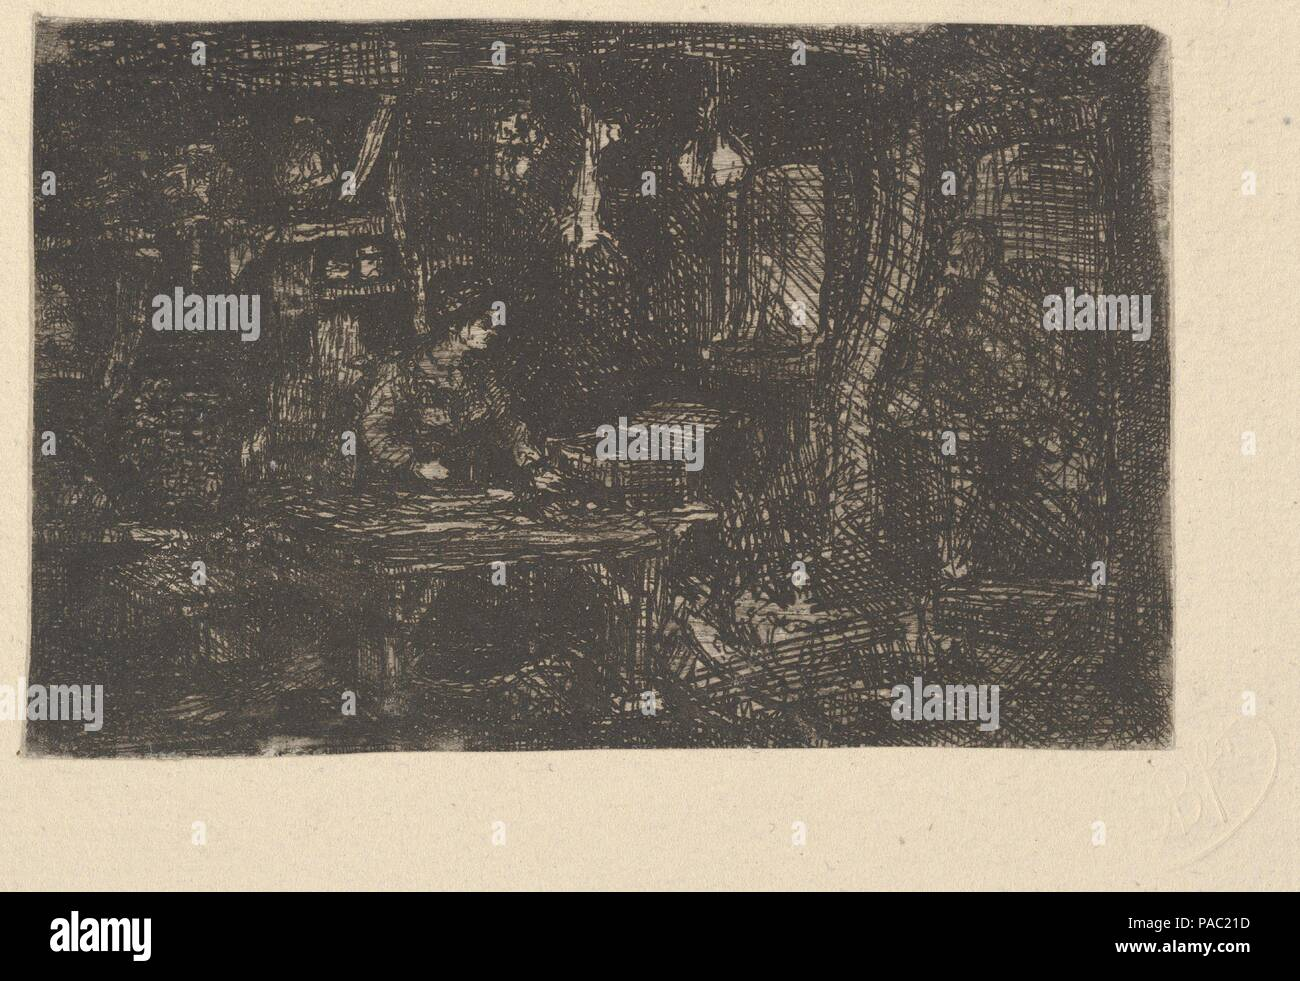 Intérieur (Inneres). Artist: Rodolphe Bresdin (Französisch, Montrelais 1822-1885 Sèvres). Abmessungen: Mount: 9 3/4 x 13 3/4 in. (24,8 × 35 cm) Blatt: 2 5/8 x 4 in. (6,6 × 10,2 cm). Datum: 19. Museum: Metropolitan Museum of Art, New York, USA. Stockbild